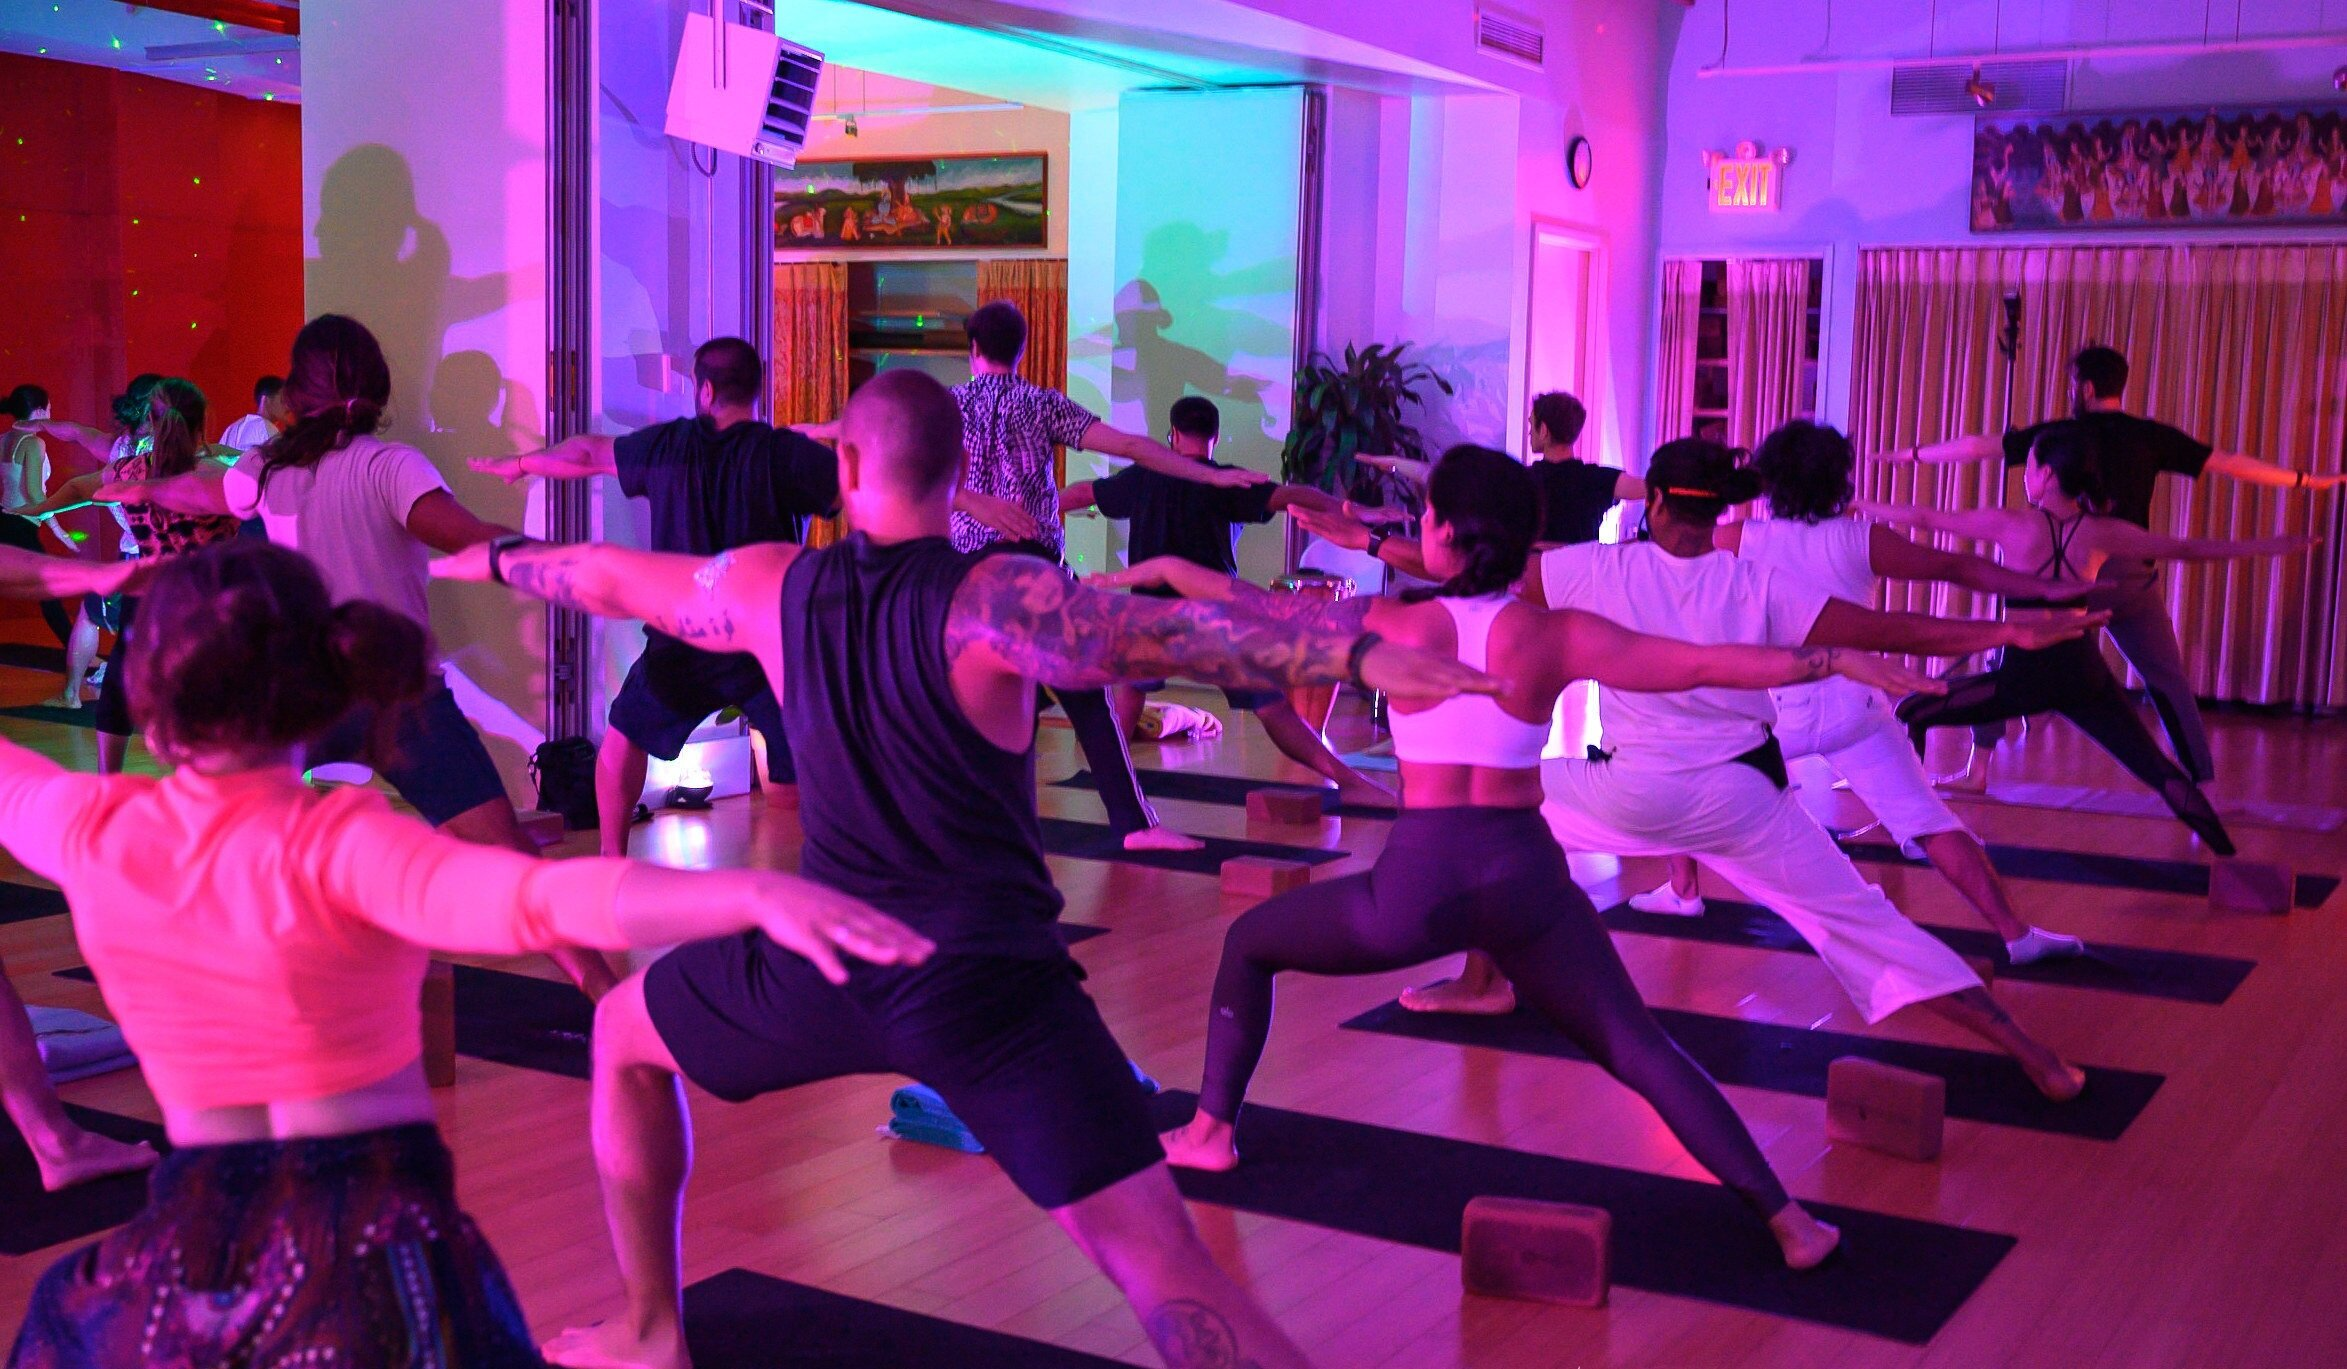 jade+min+akasha+-+cosmic+yoga+party.jpg